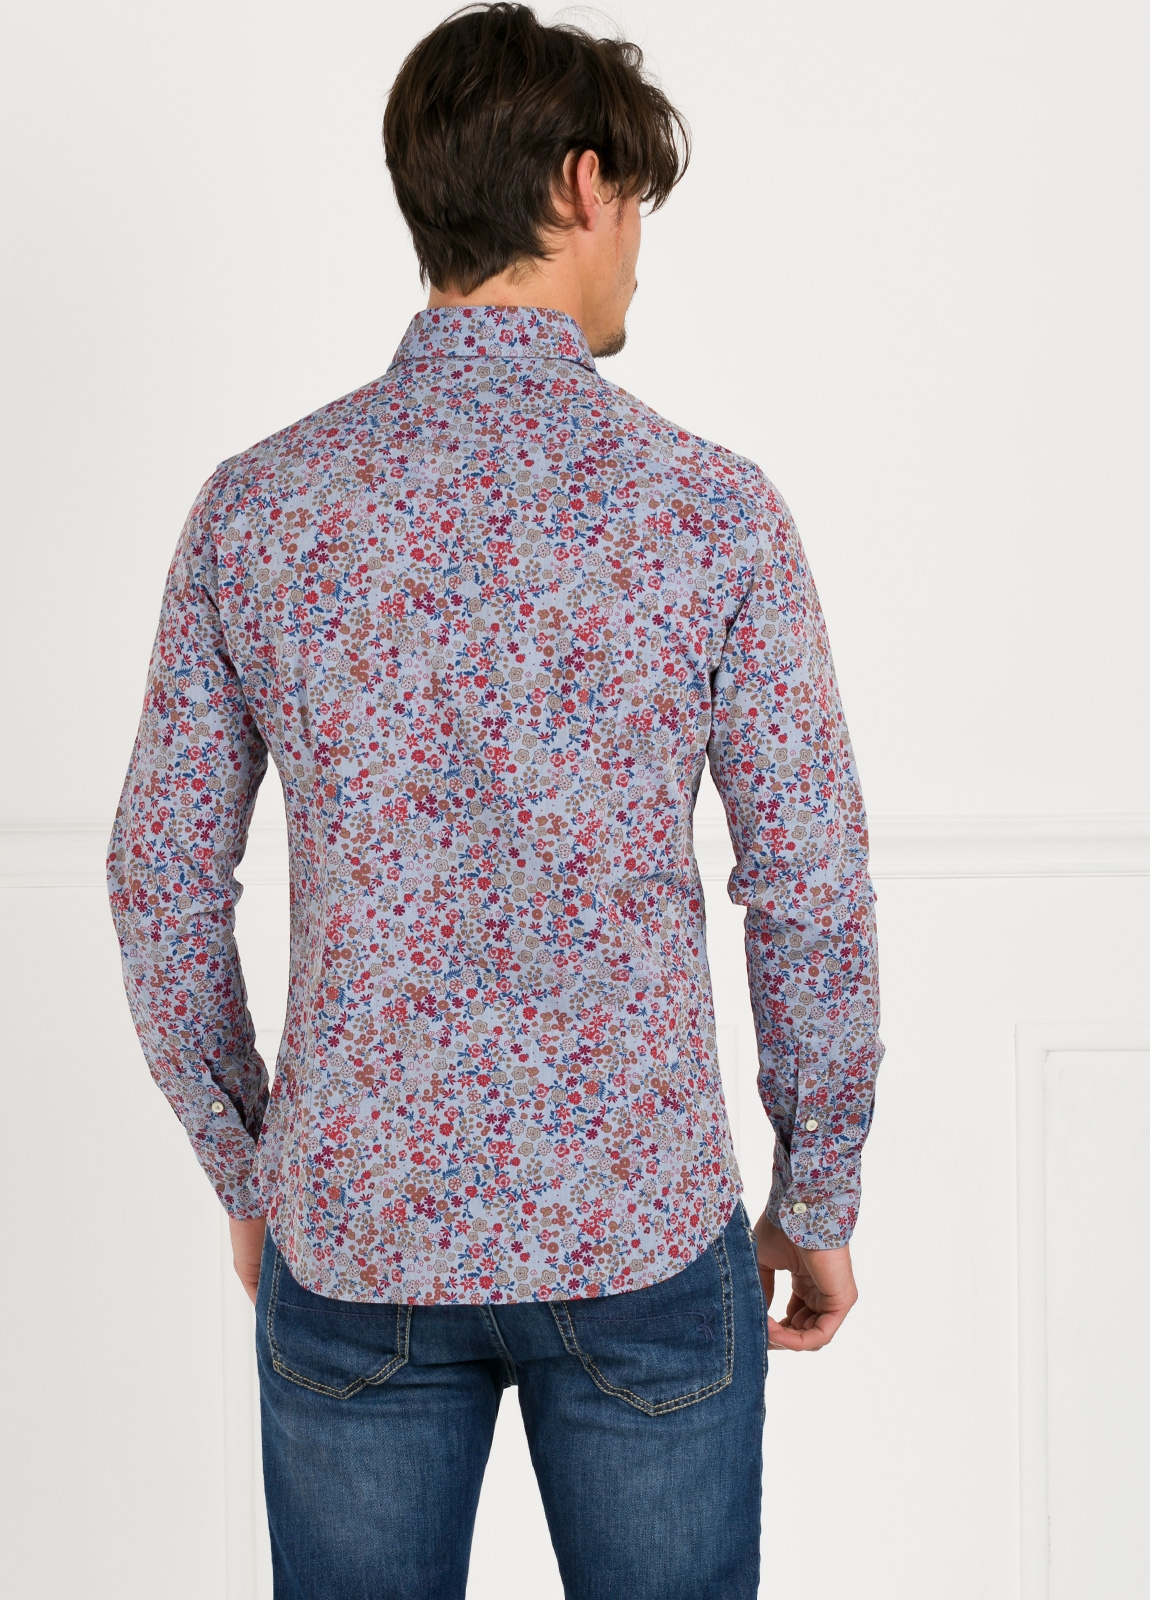 Camisa Leisure Wear SLIM FIT modelo PORTO dibujo floral fondo blanco. 100% Algodón. - Ítem3